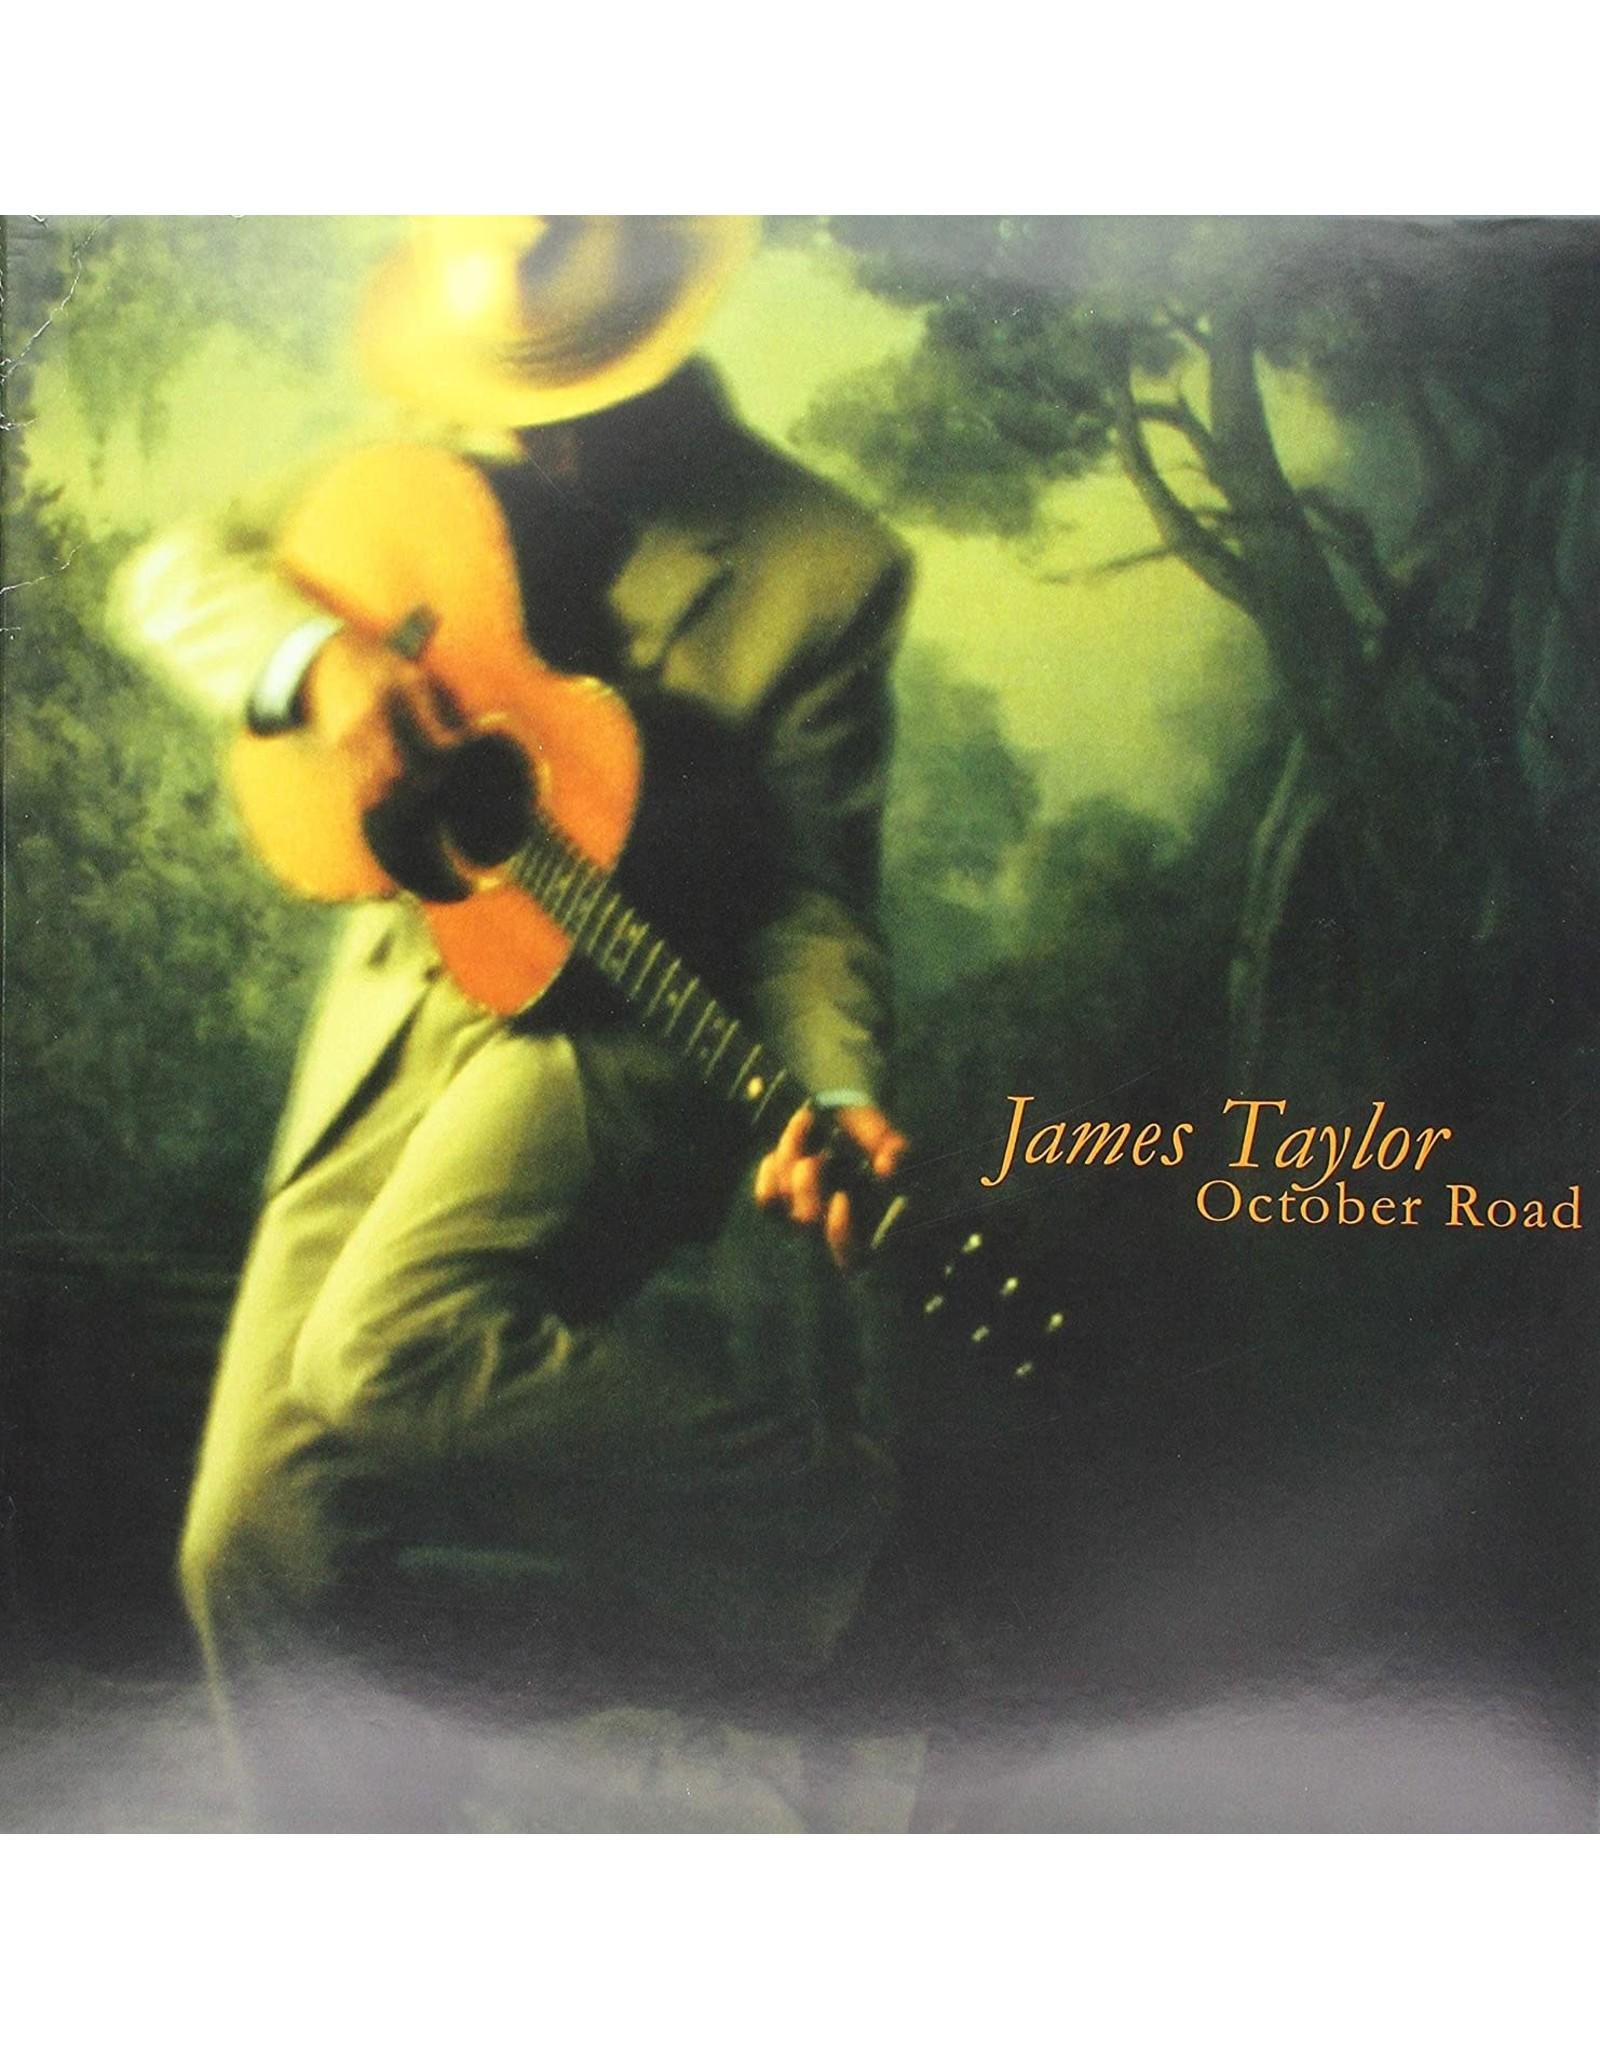 James Taylor - October Road